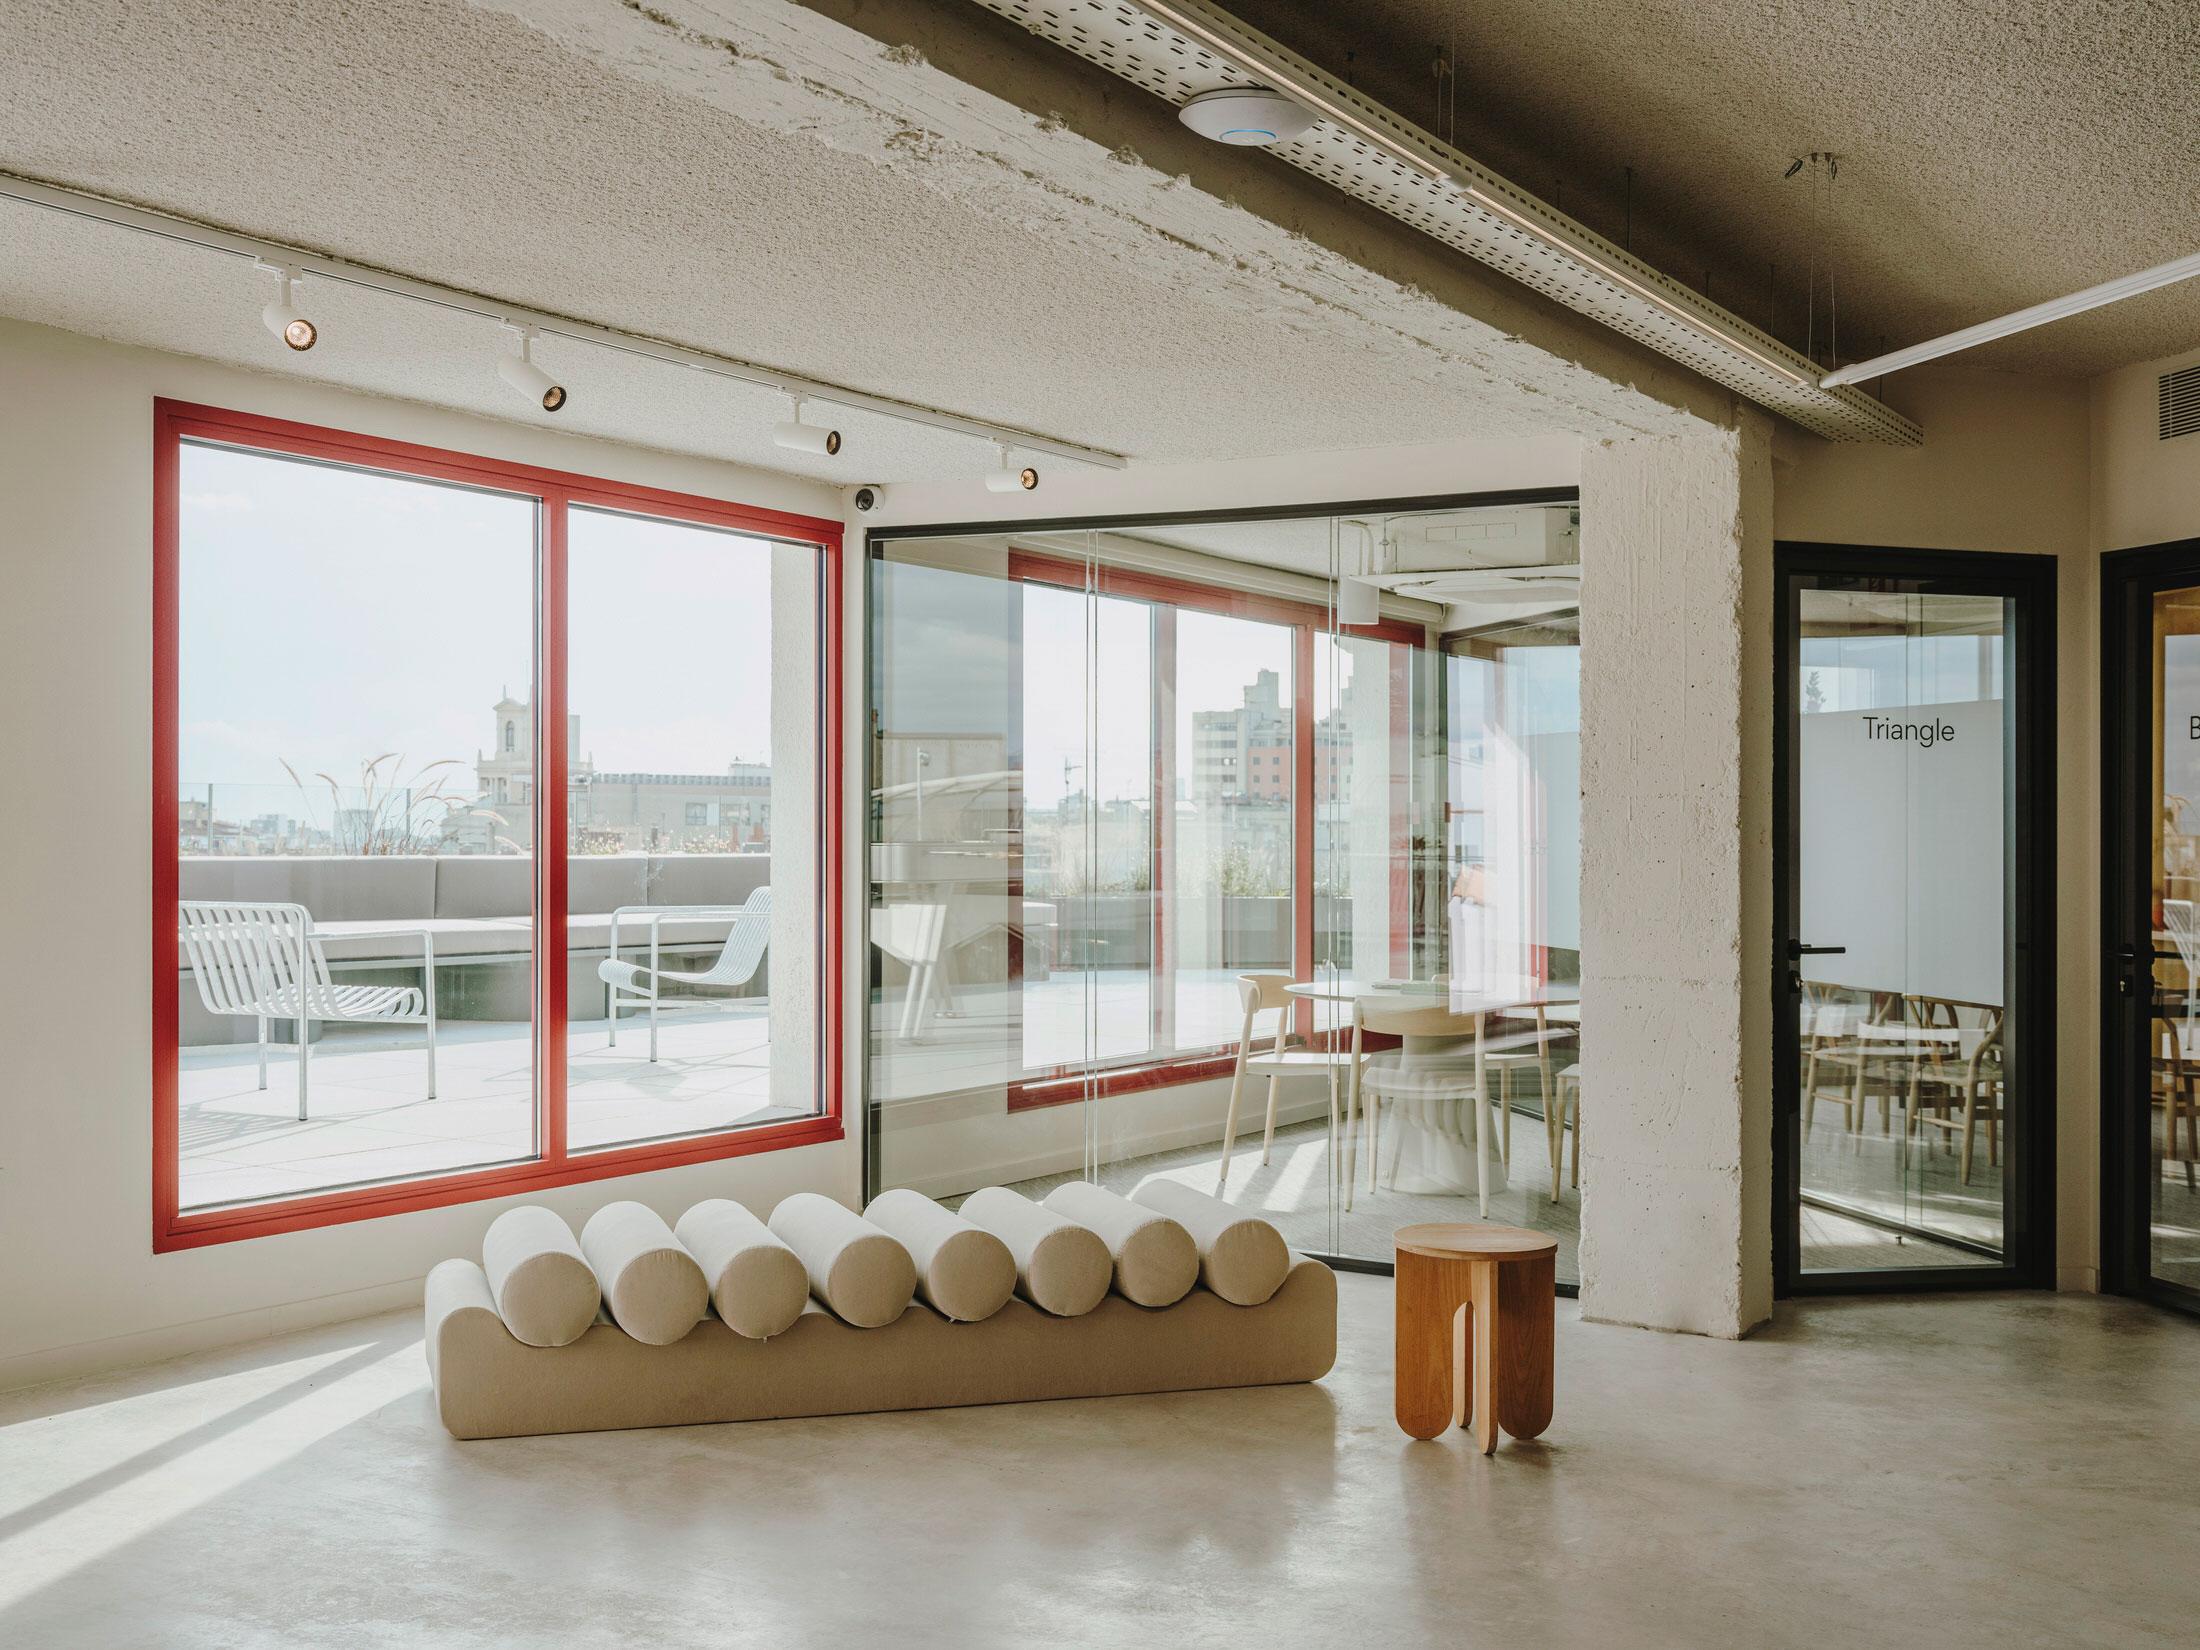 Mesura Architecture Design Cloudworks Penthouse Office Barcelona Photo Salva Lopez Yellowtrace 07